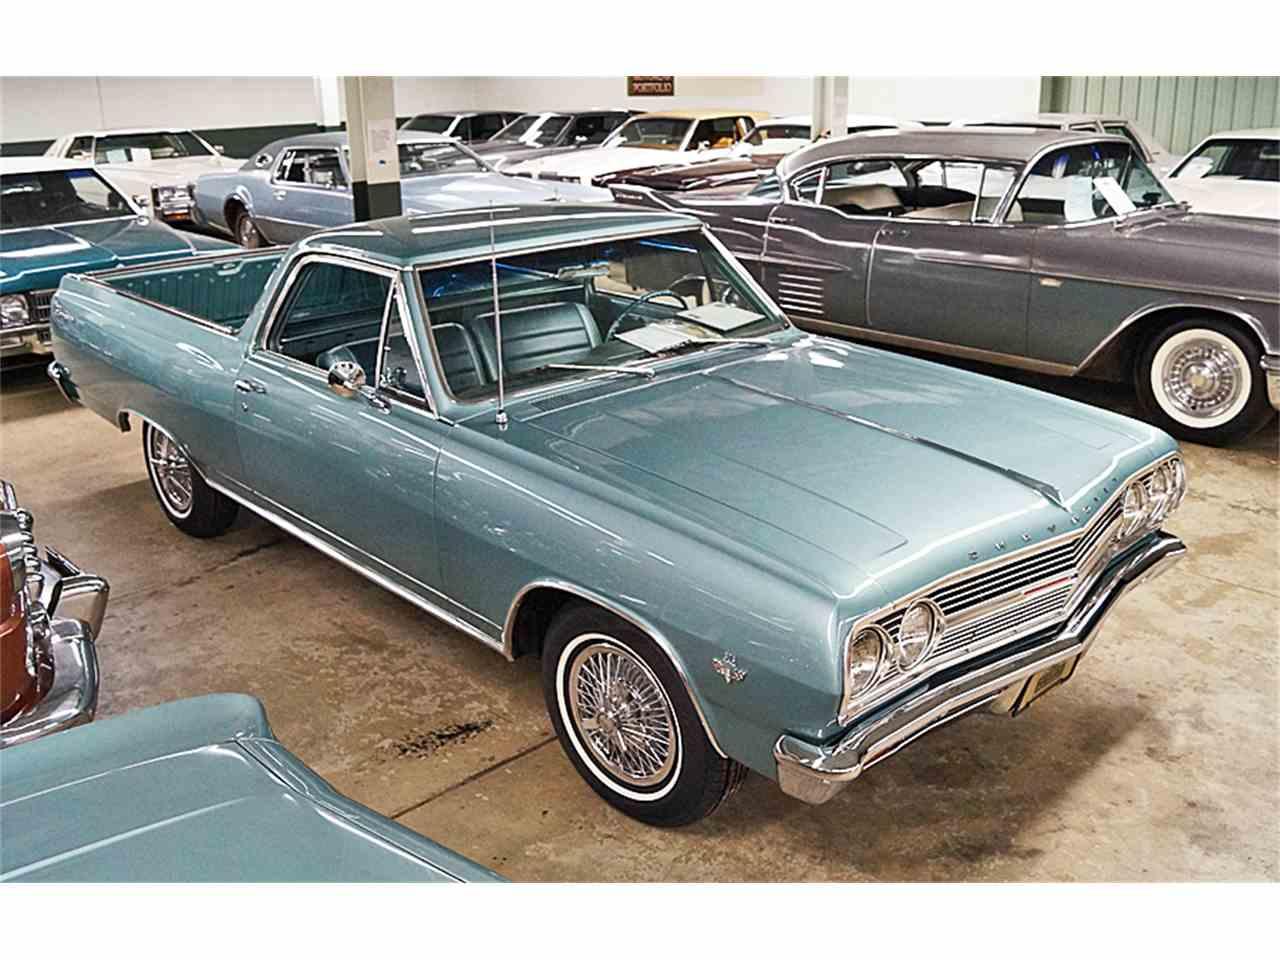 1965 Chevrolet El Camino for Sale | ClassicCars.com | CC-1046907